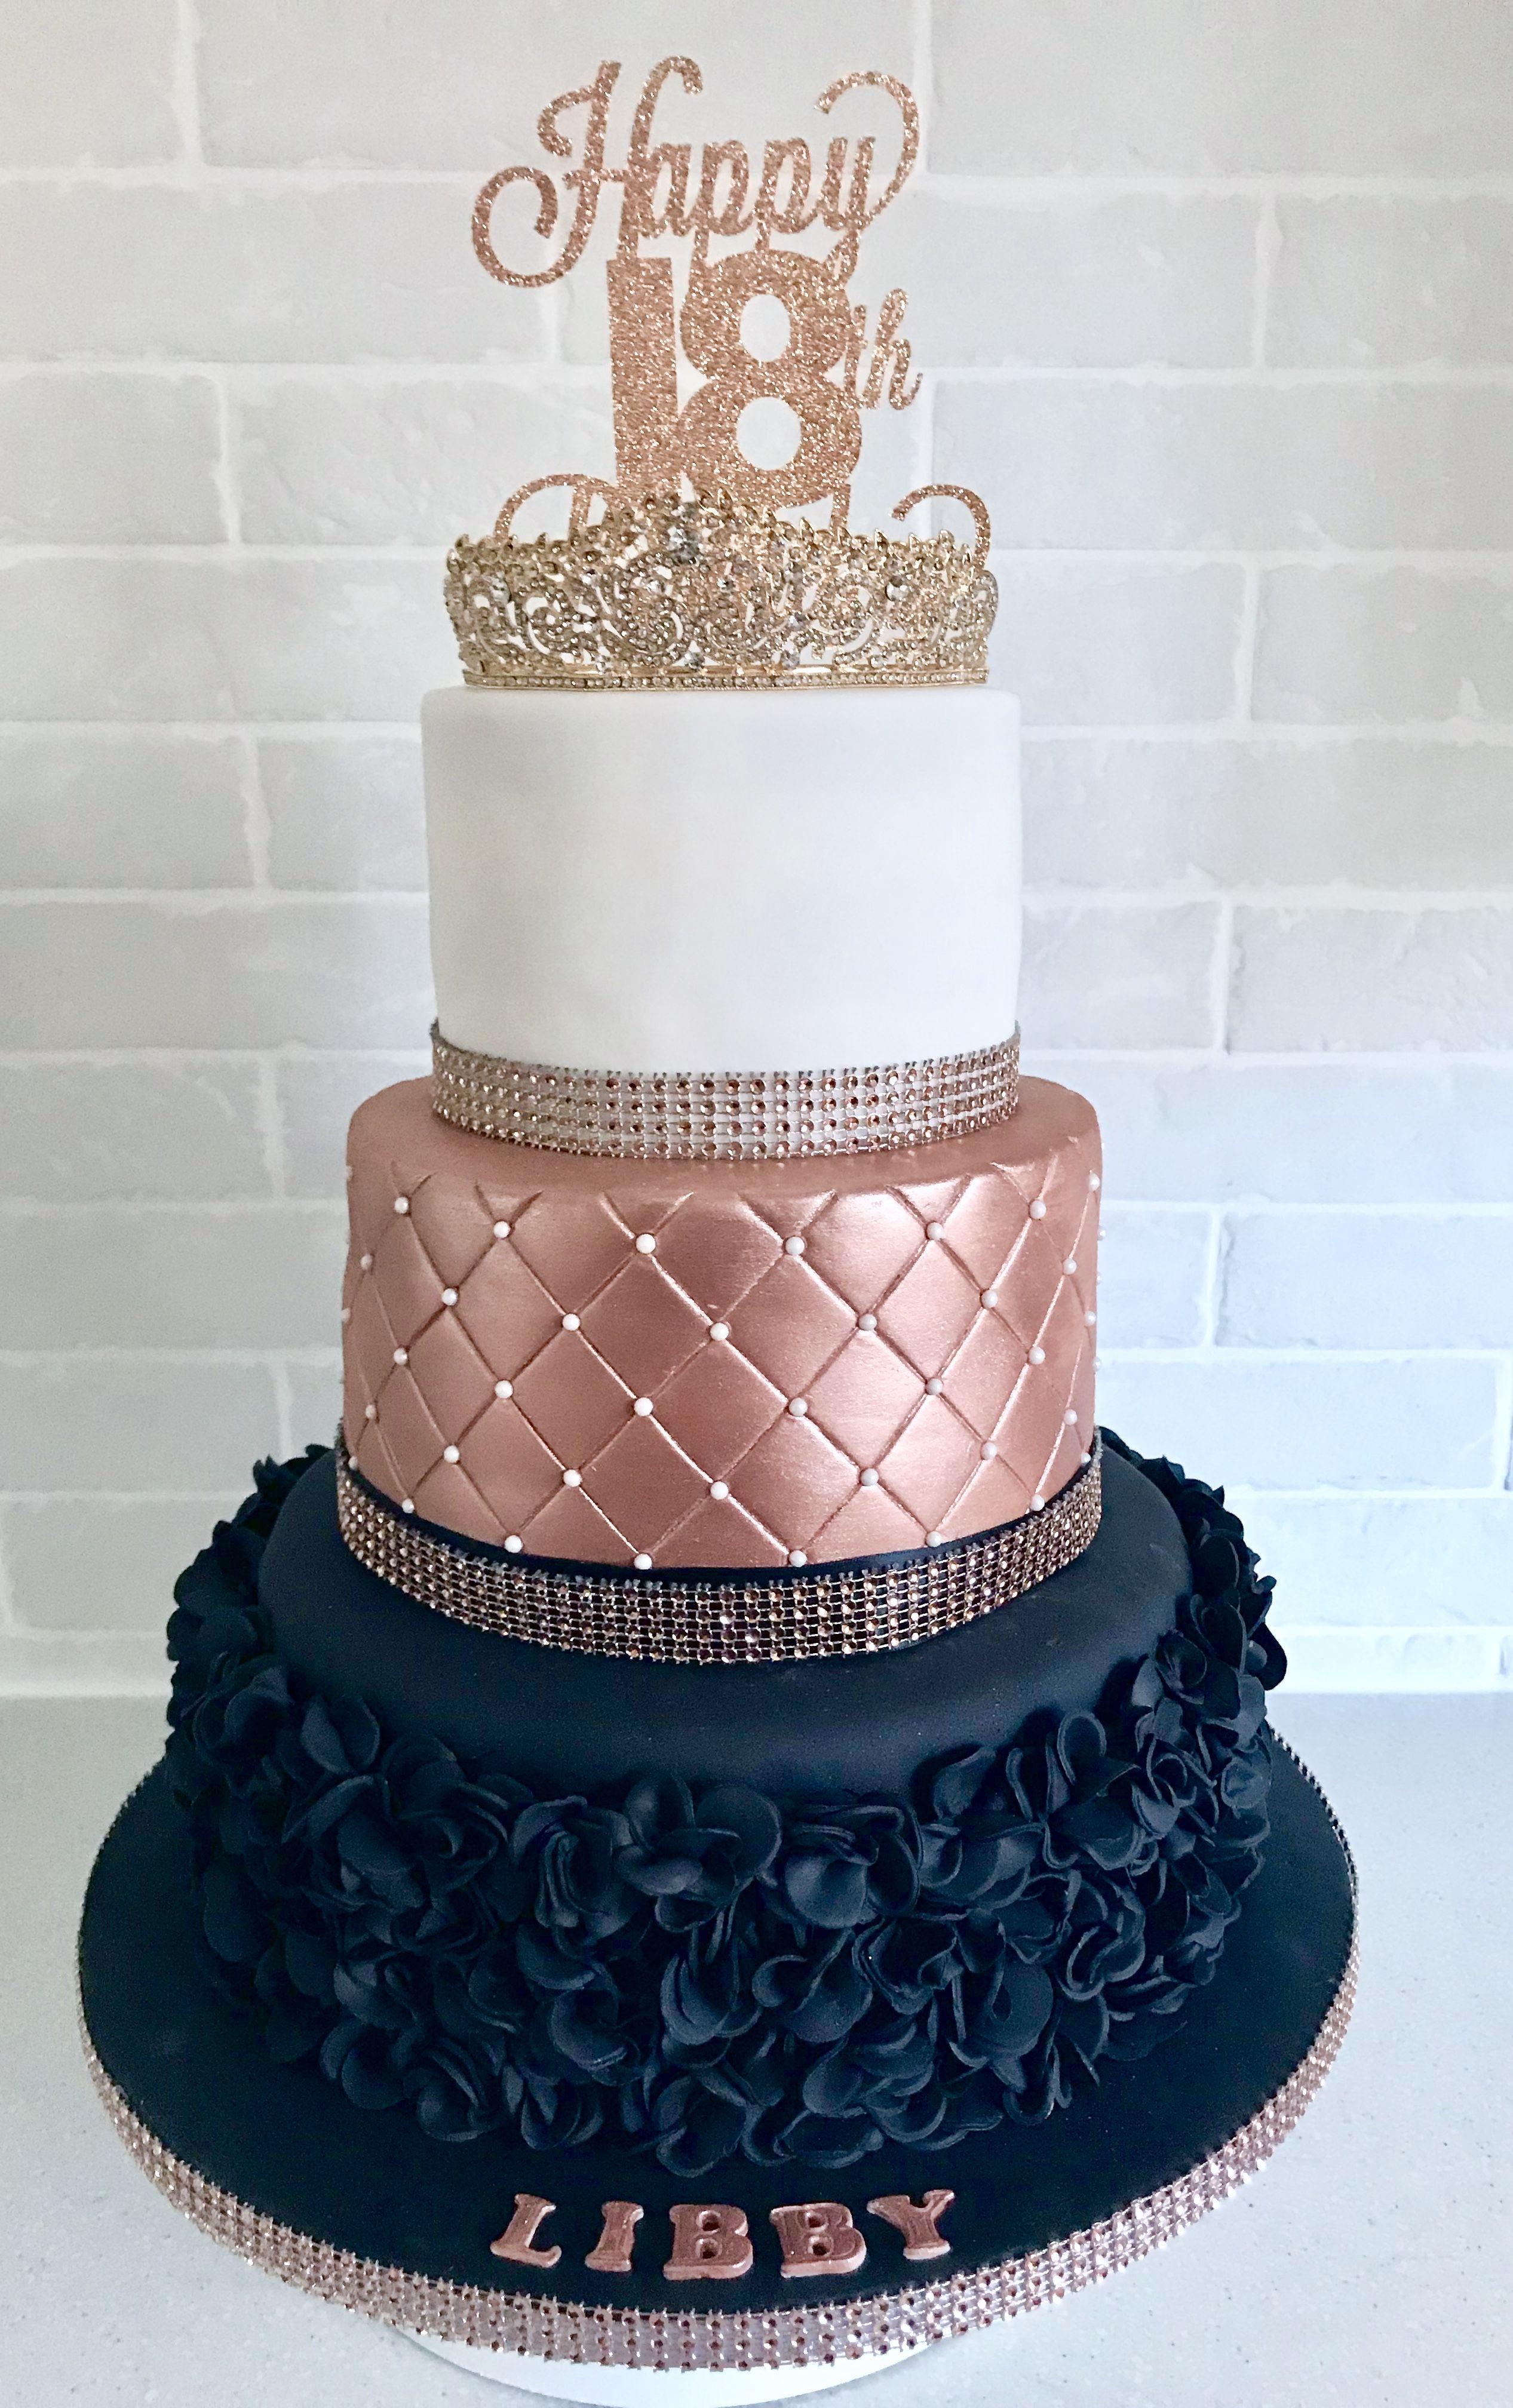 18th Birthday Cake Ideas Female : birthday, ideas, female, Gorgeous, Black, Ruffle, Birthday, Tiara, (detachable, Wearabl…, Girls,, Sweet, Cake,, Cakes